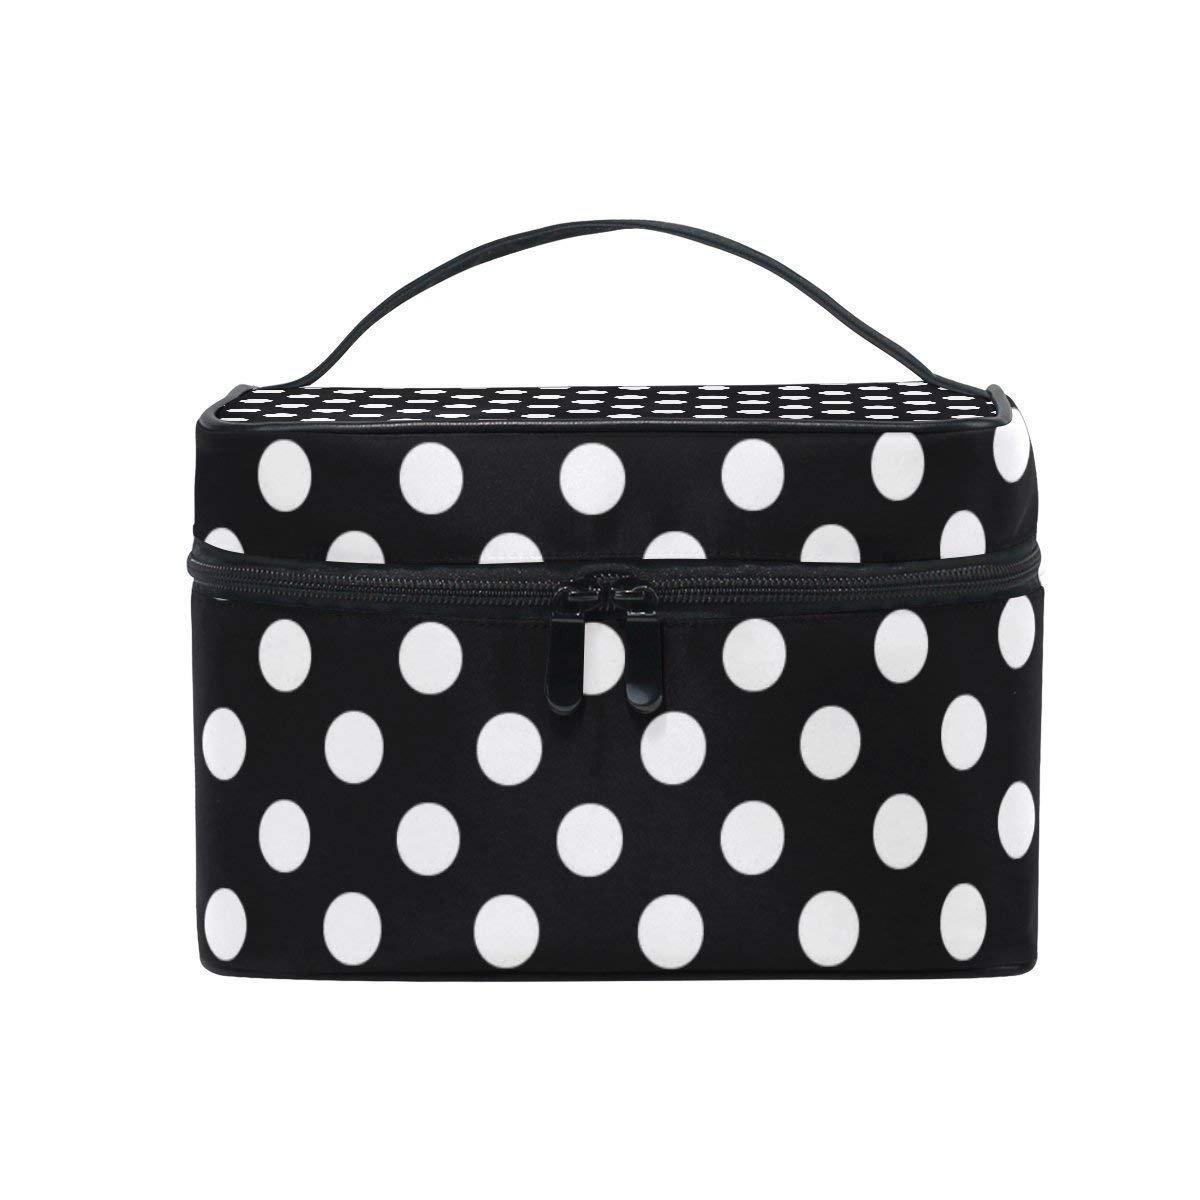 8ab2854c7e1f Amazon.com   Toiletry Bag Black White Polka Dot Cosmetic Bags Travel Makeup  Train Cases Storage Organizer   Beauty